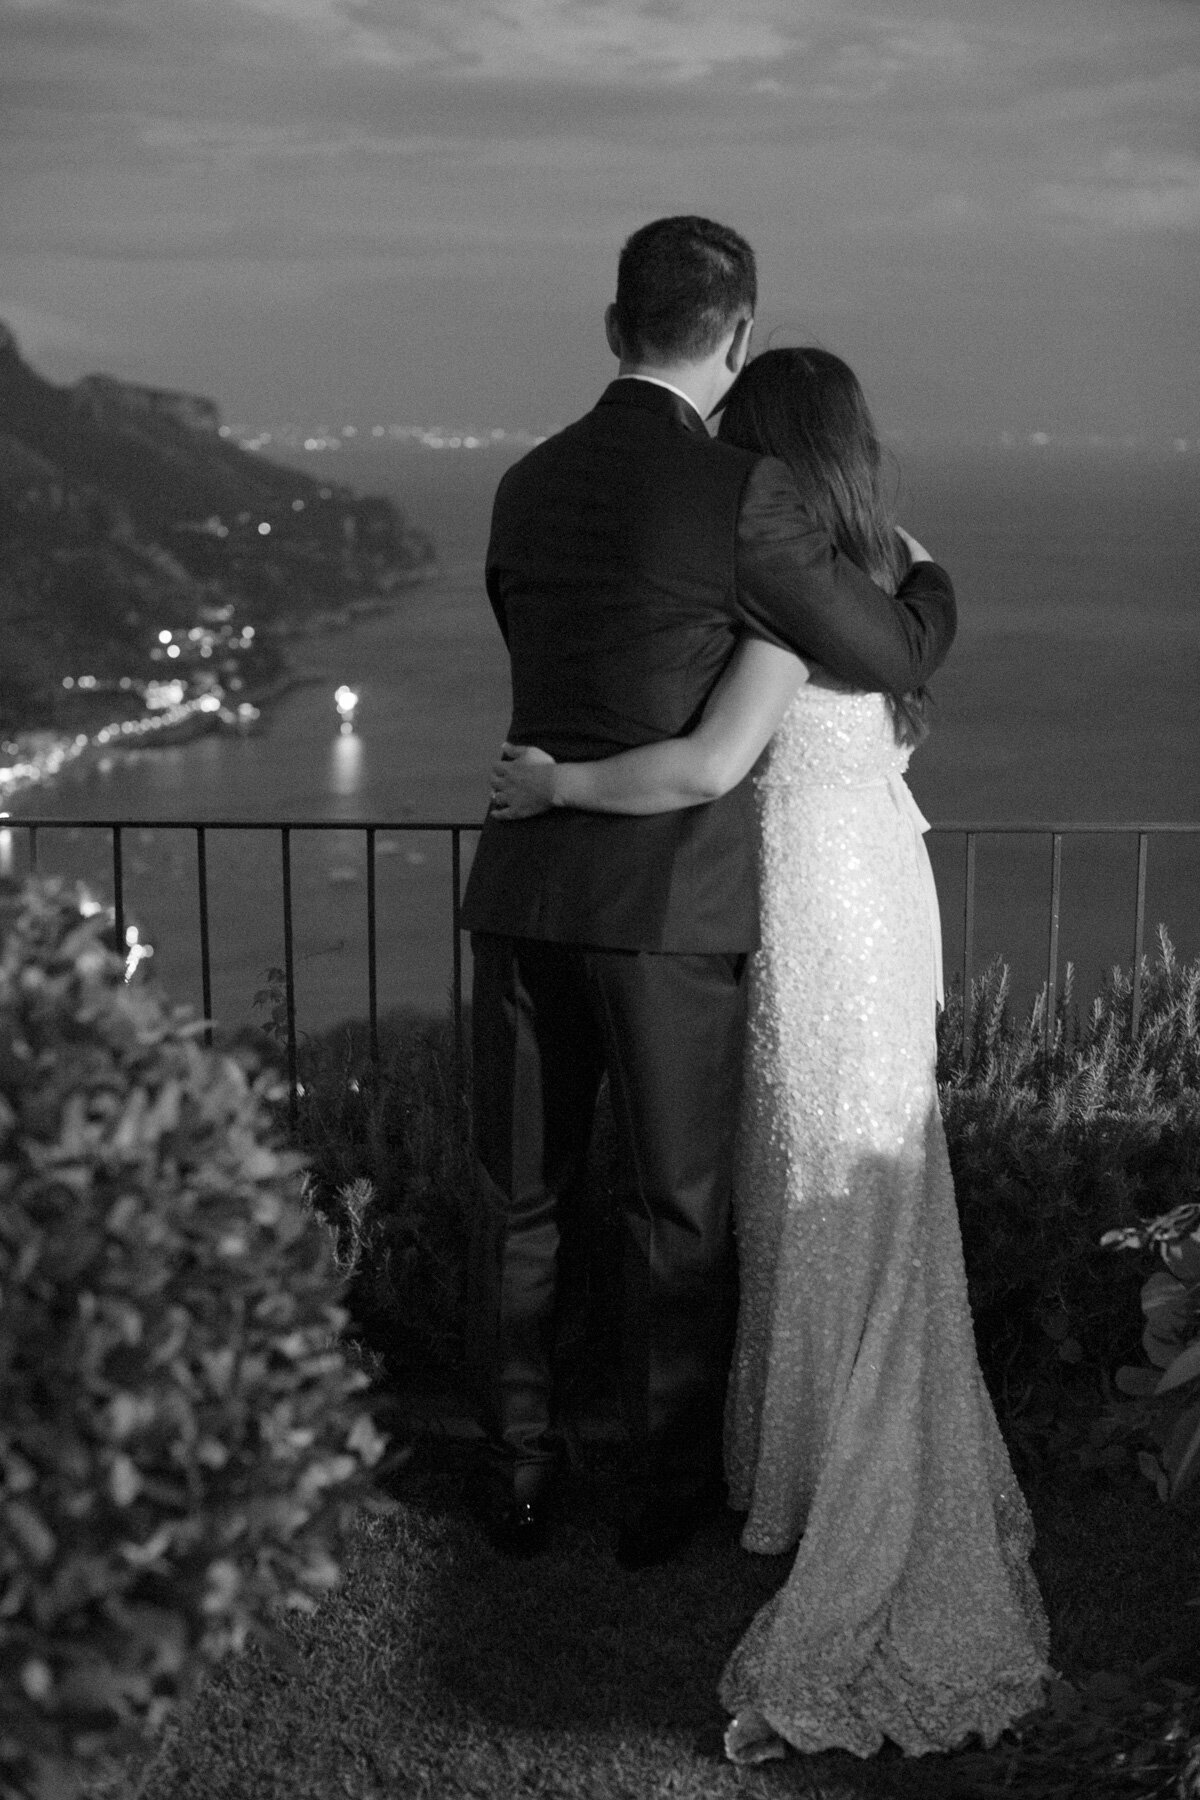 Belmond-Hotel-Caruso-ravello-elopement-Katie-Grant-destination-wedding (50 of 50).jpg